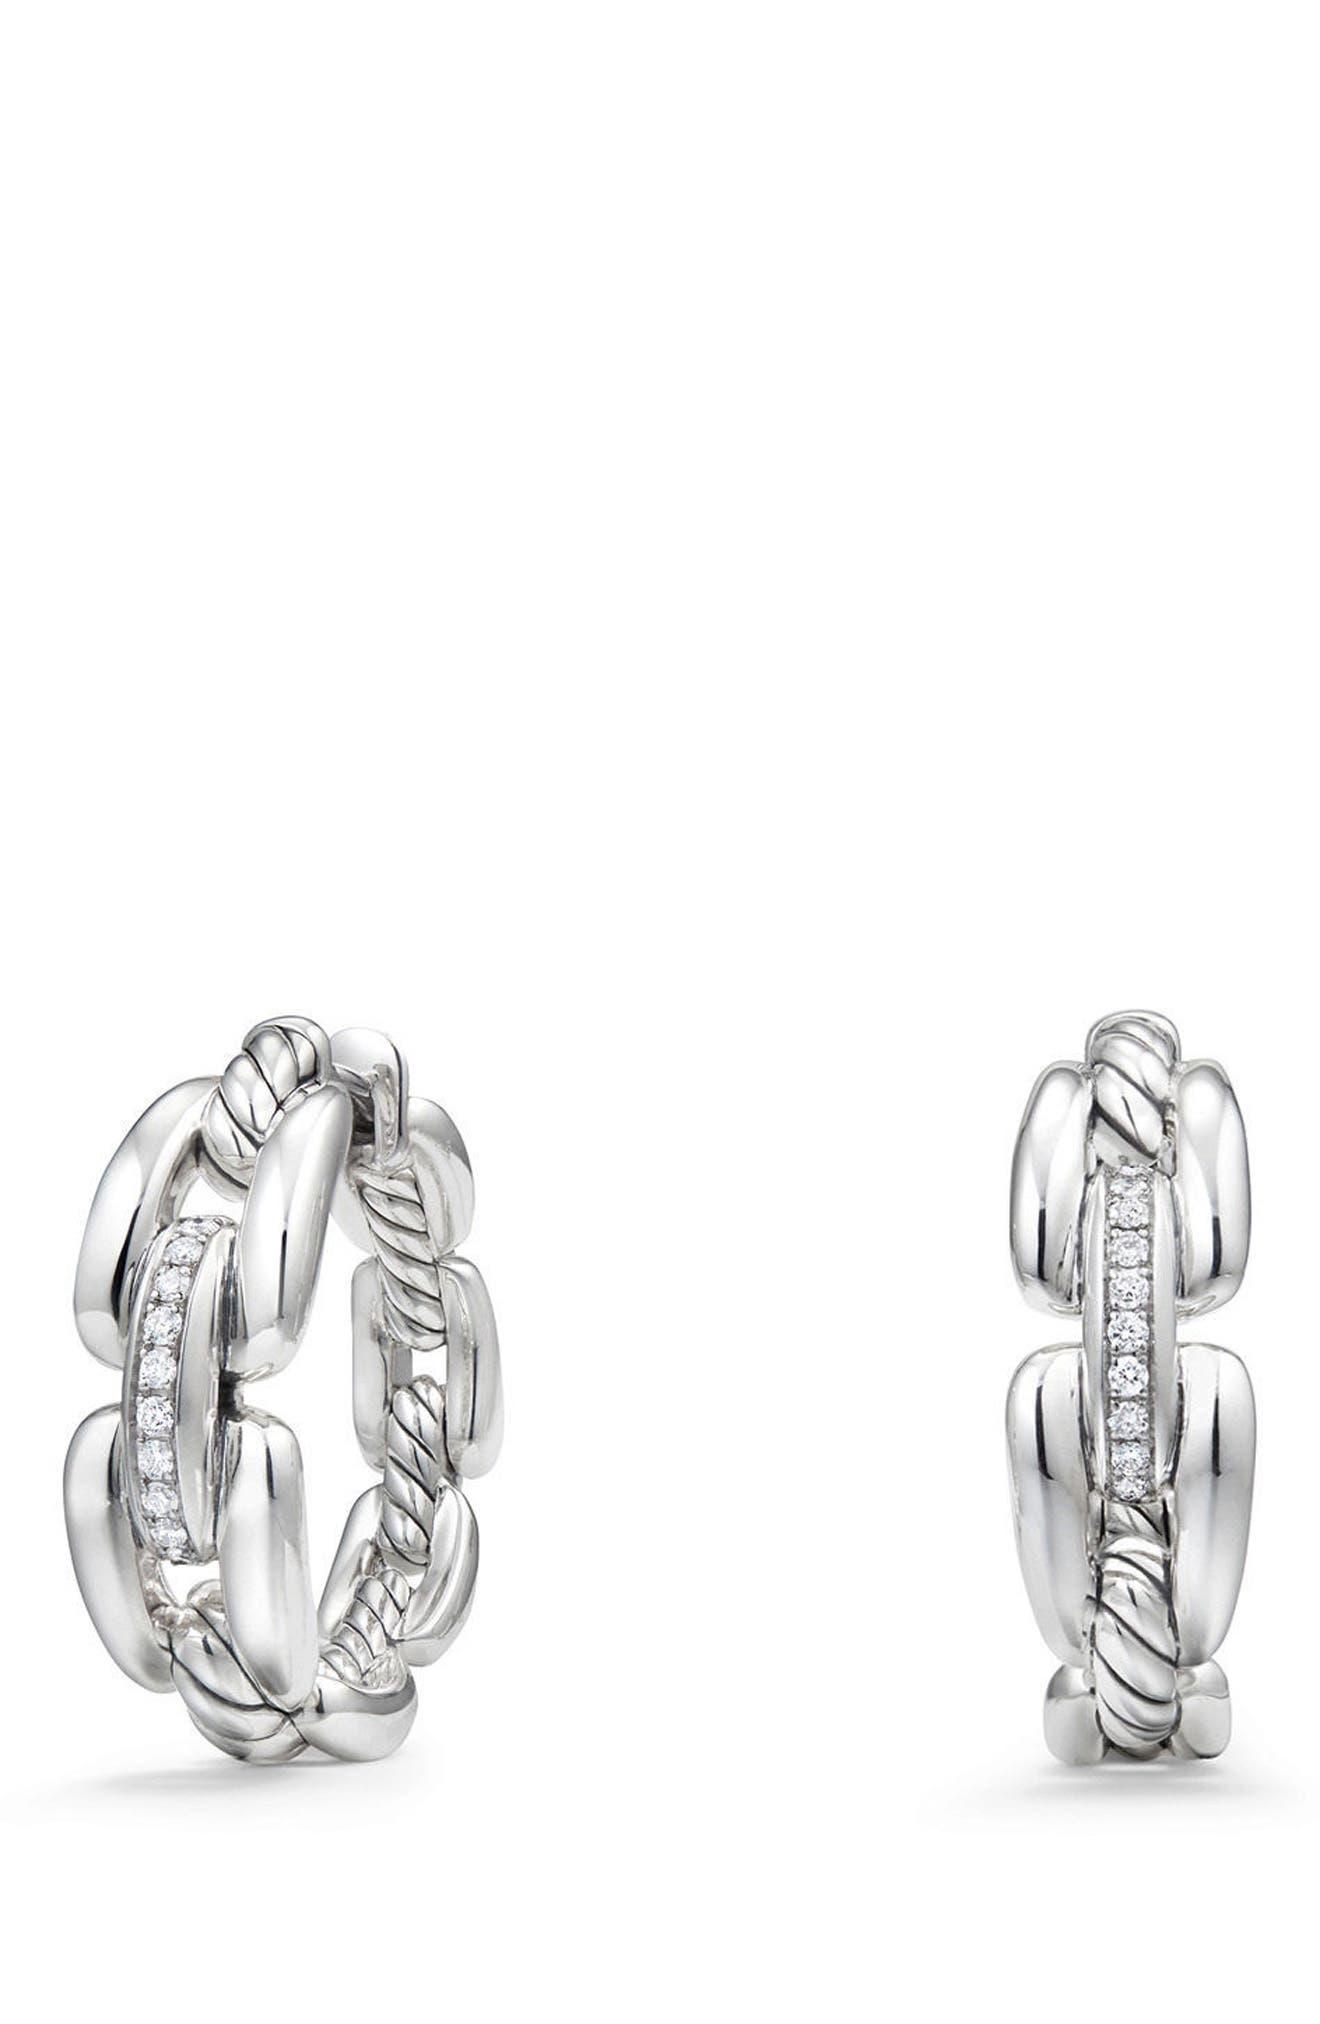 Wellesley Link Hoop Earrings with Diamonds, 23mm,                             Main thumbnail 1, color,                             SILVER